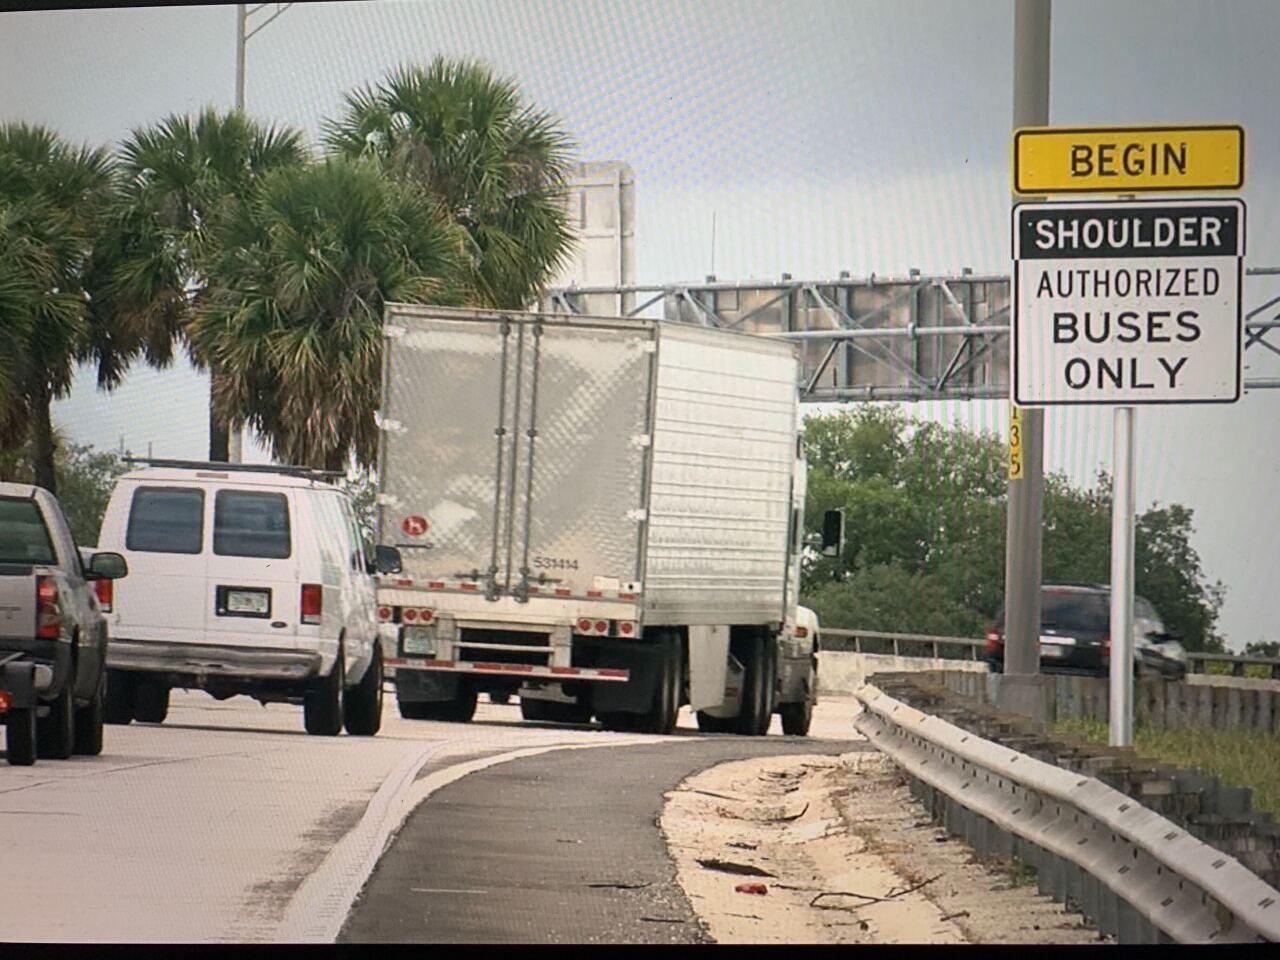 Shoulder drive